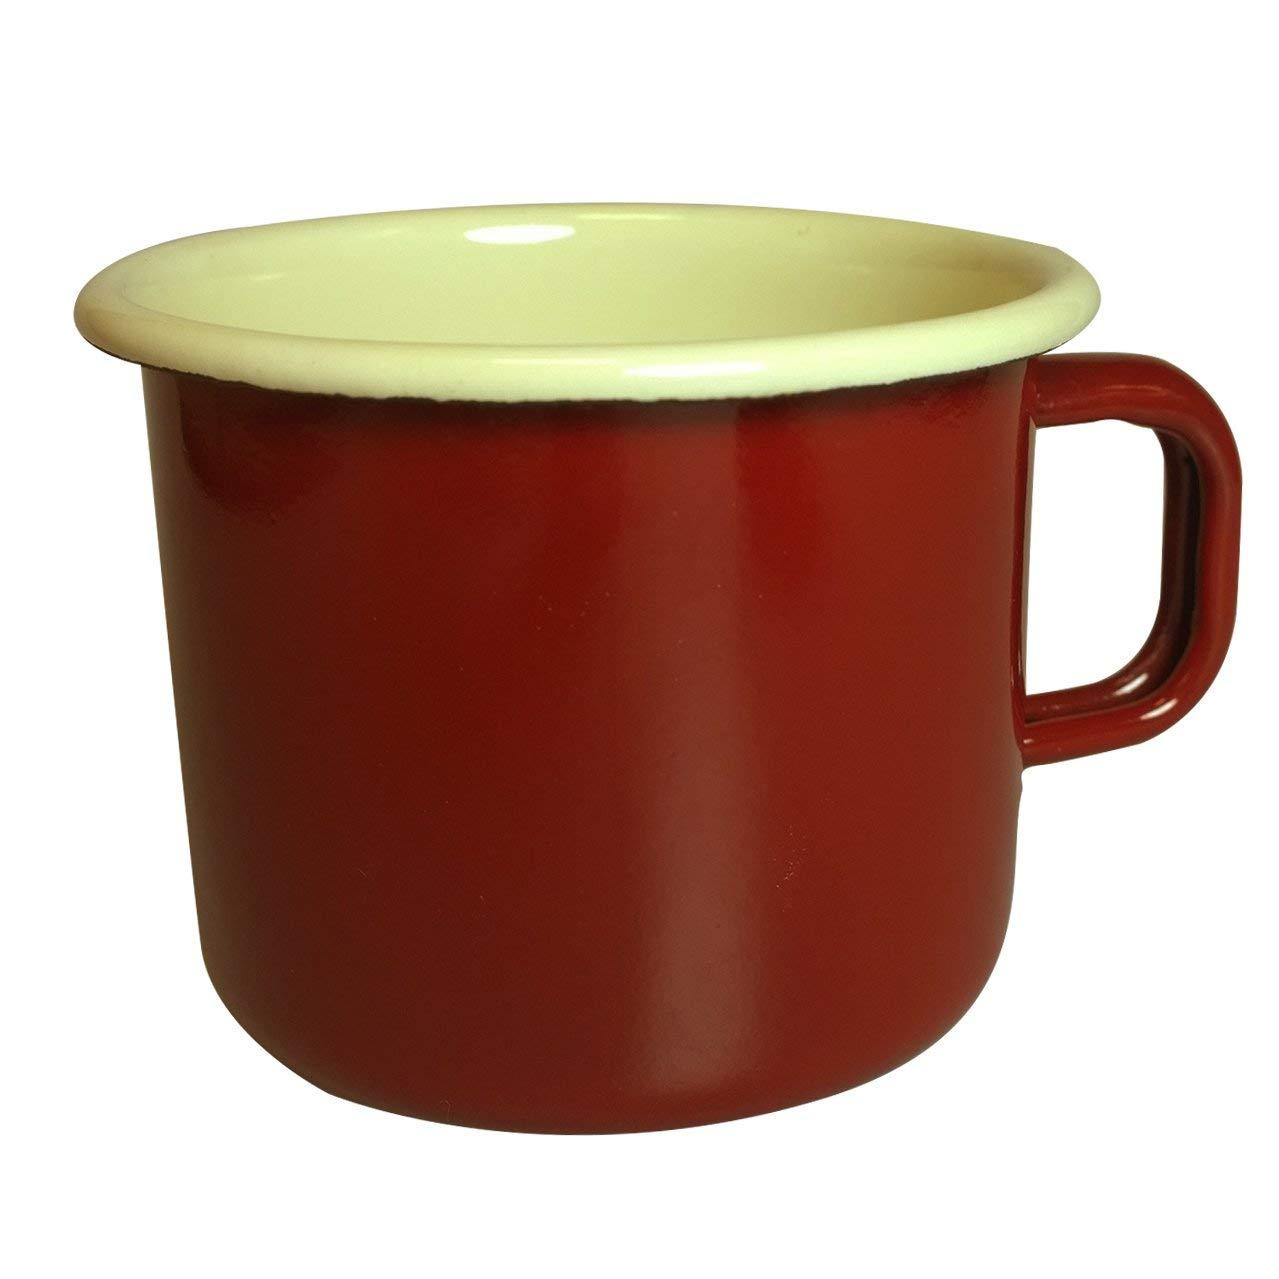 Dexam 17819189 Vintage Home 450ml Enamelware Mug, Claret Red